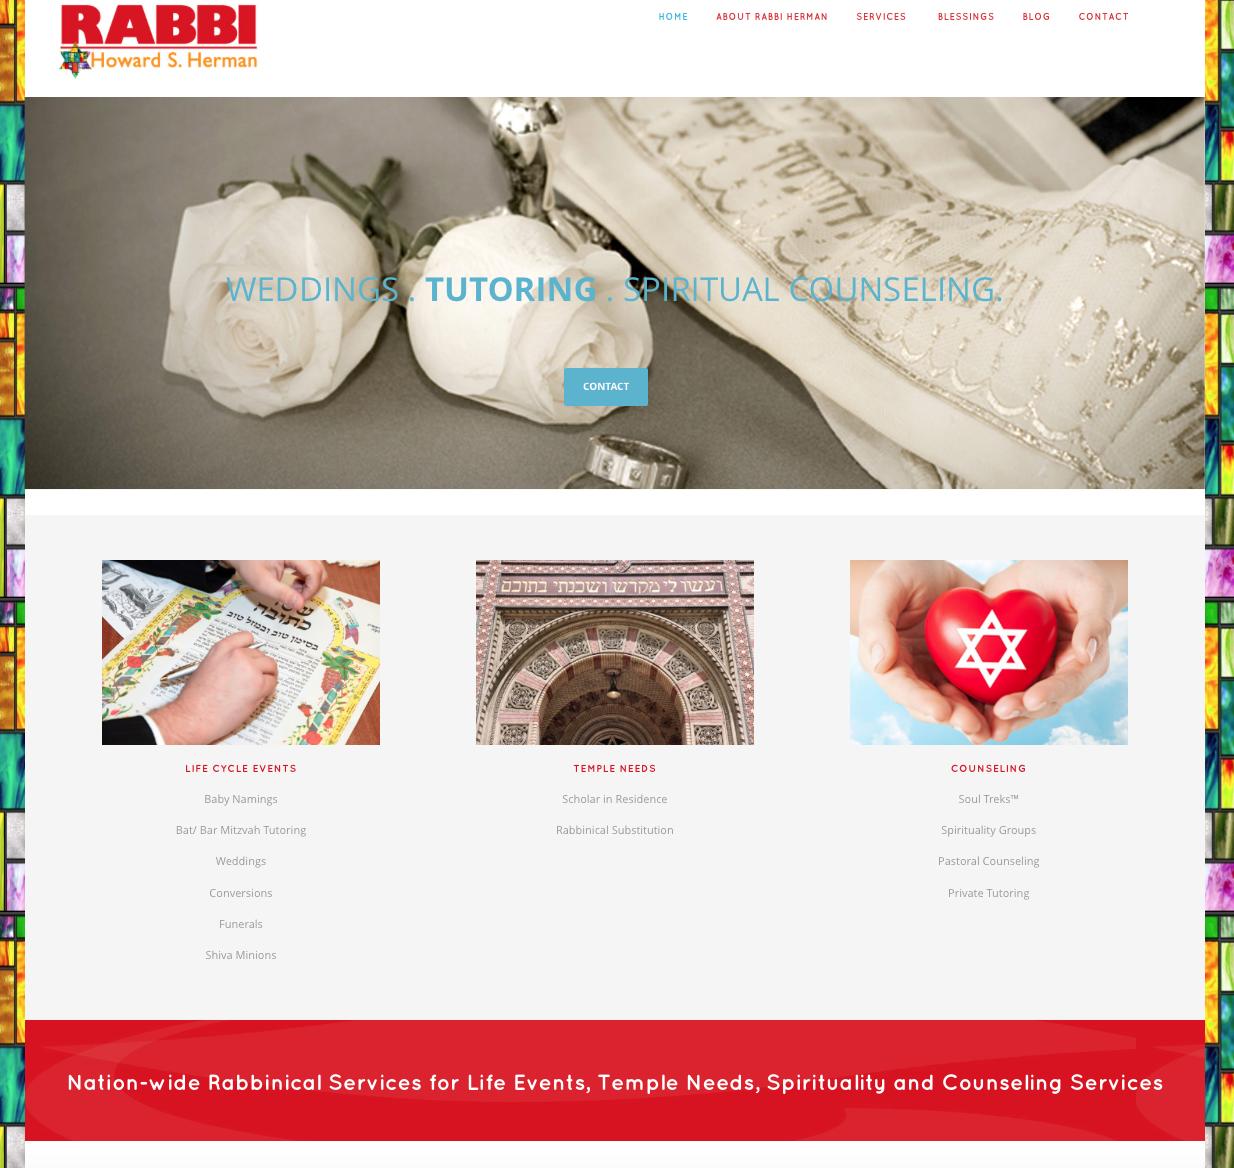 http://www.rabbiherman.com